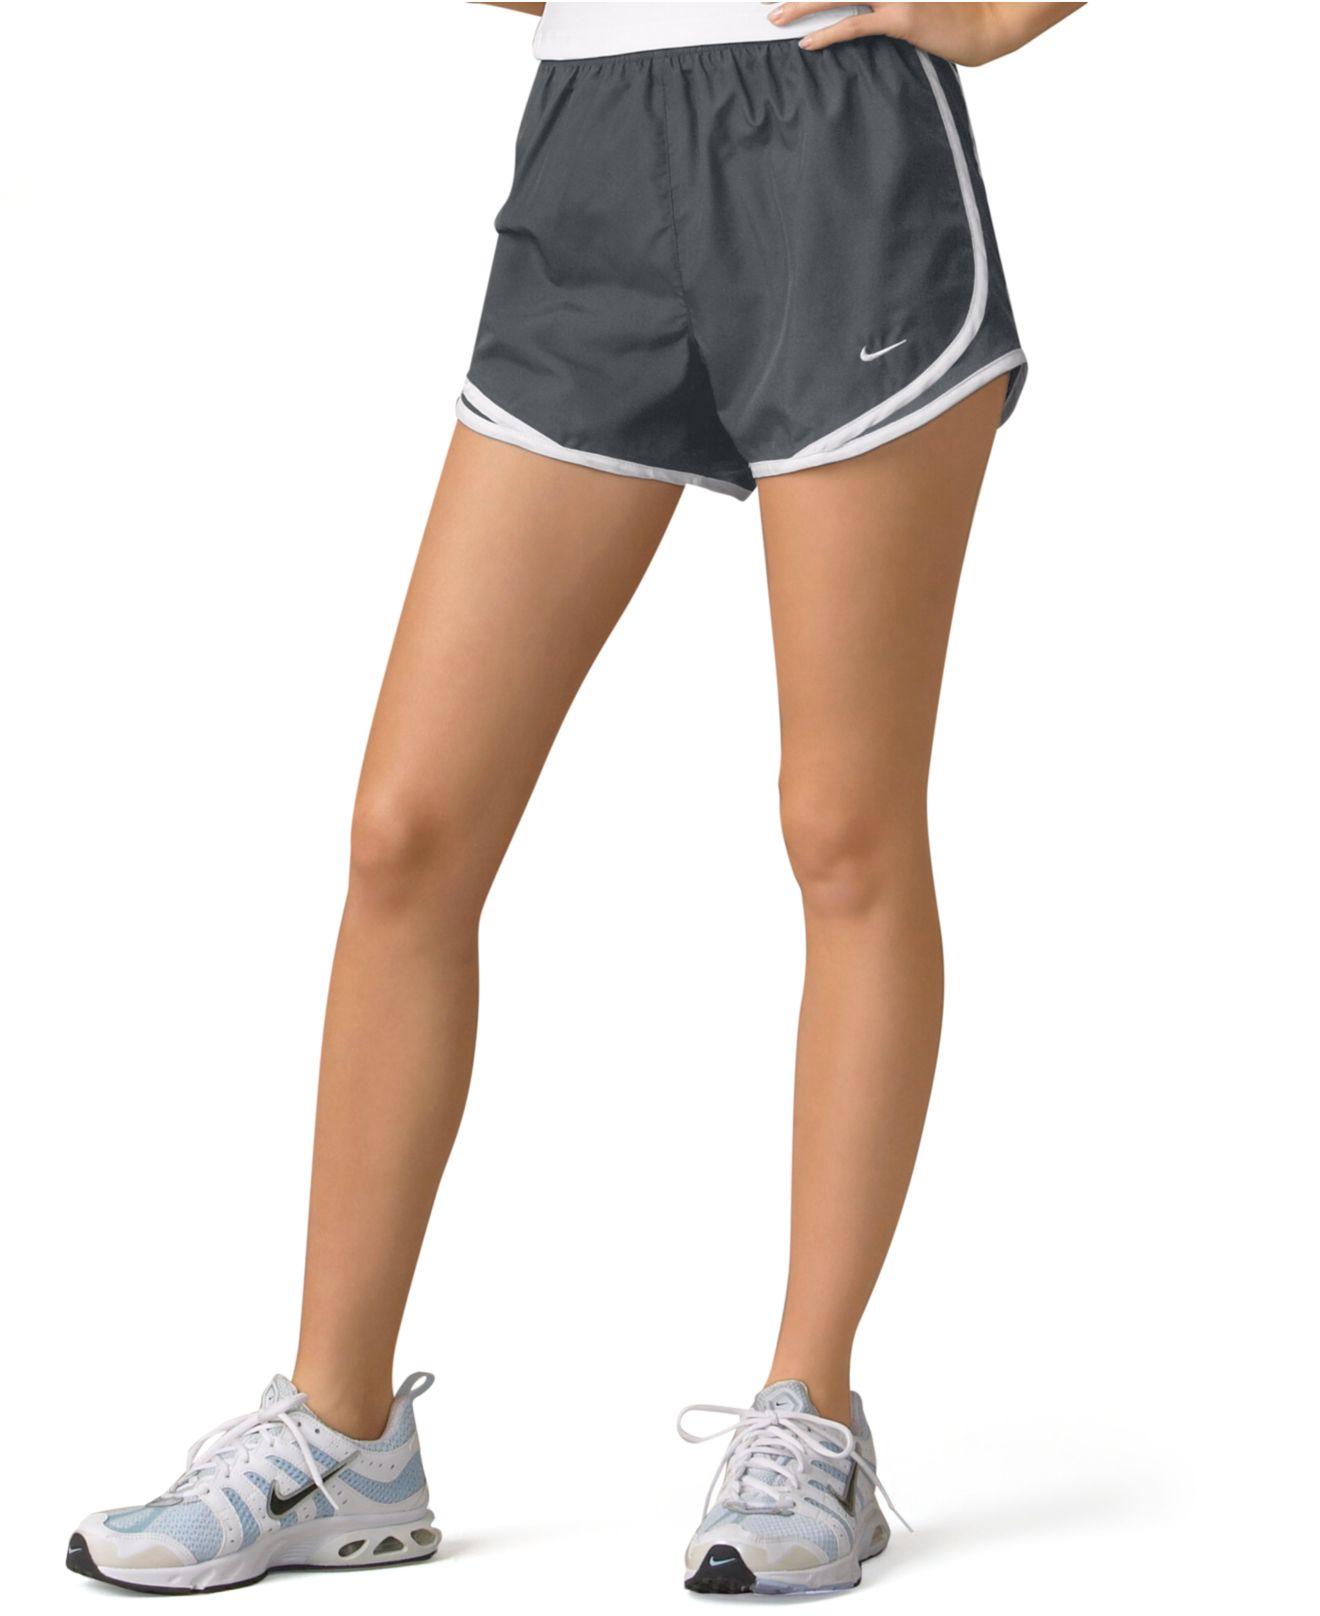 Lyst nike dri fit tempo running shorts in gray for Women s running shirt